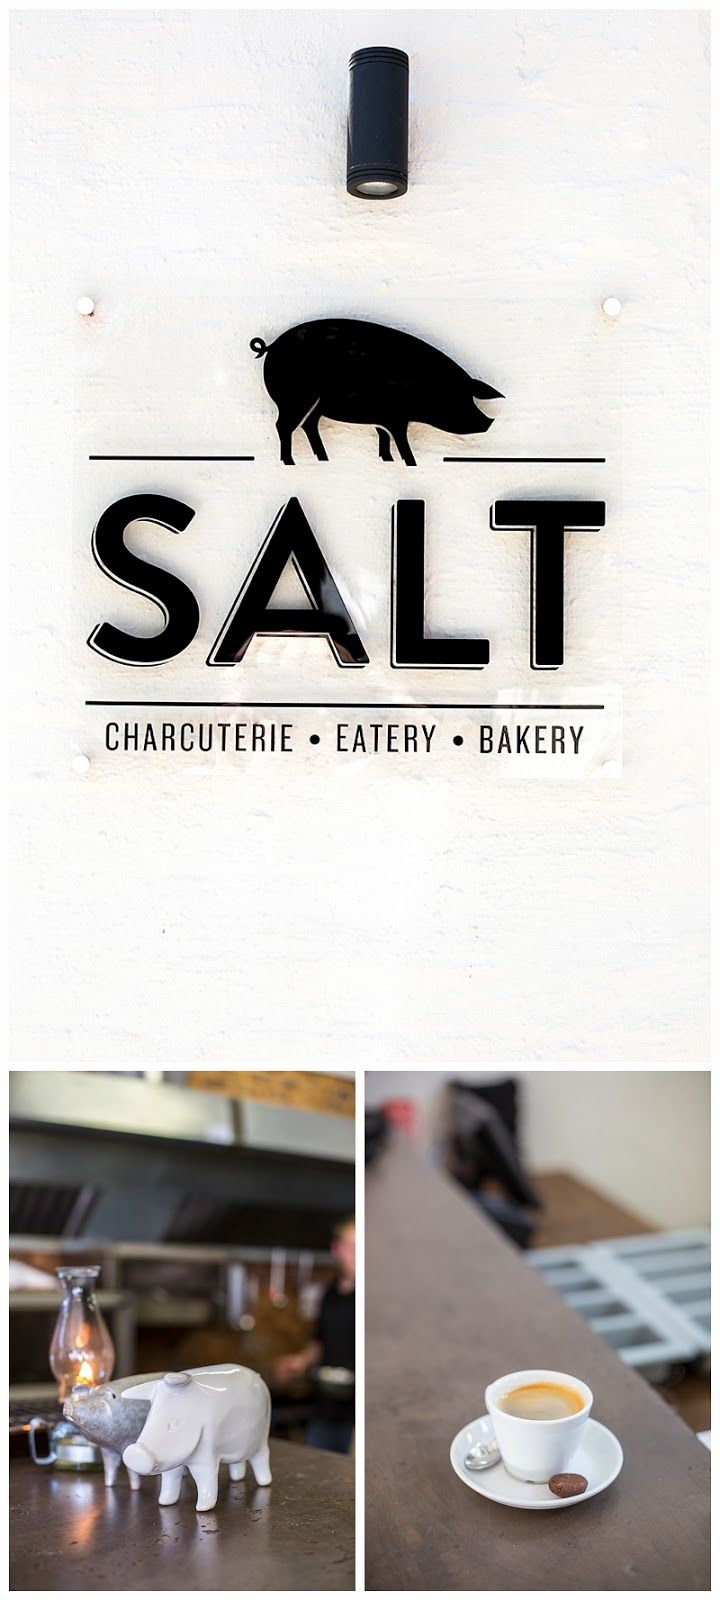 SALT: Charcuterie, Eatery, Bakery in Pretoria